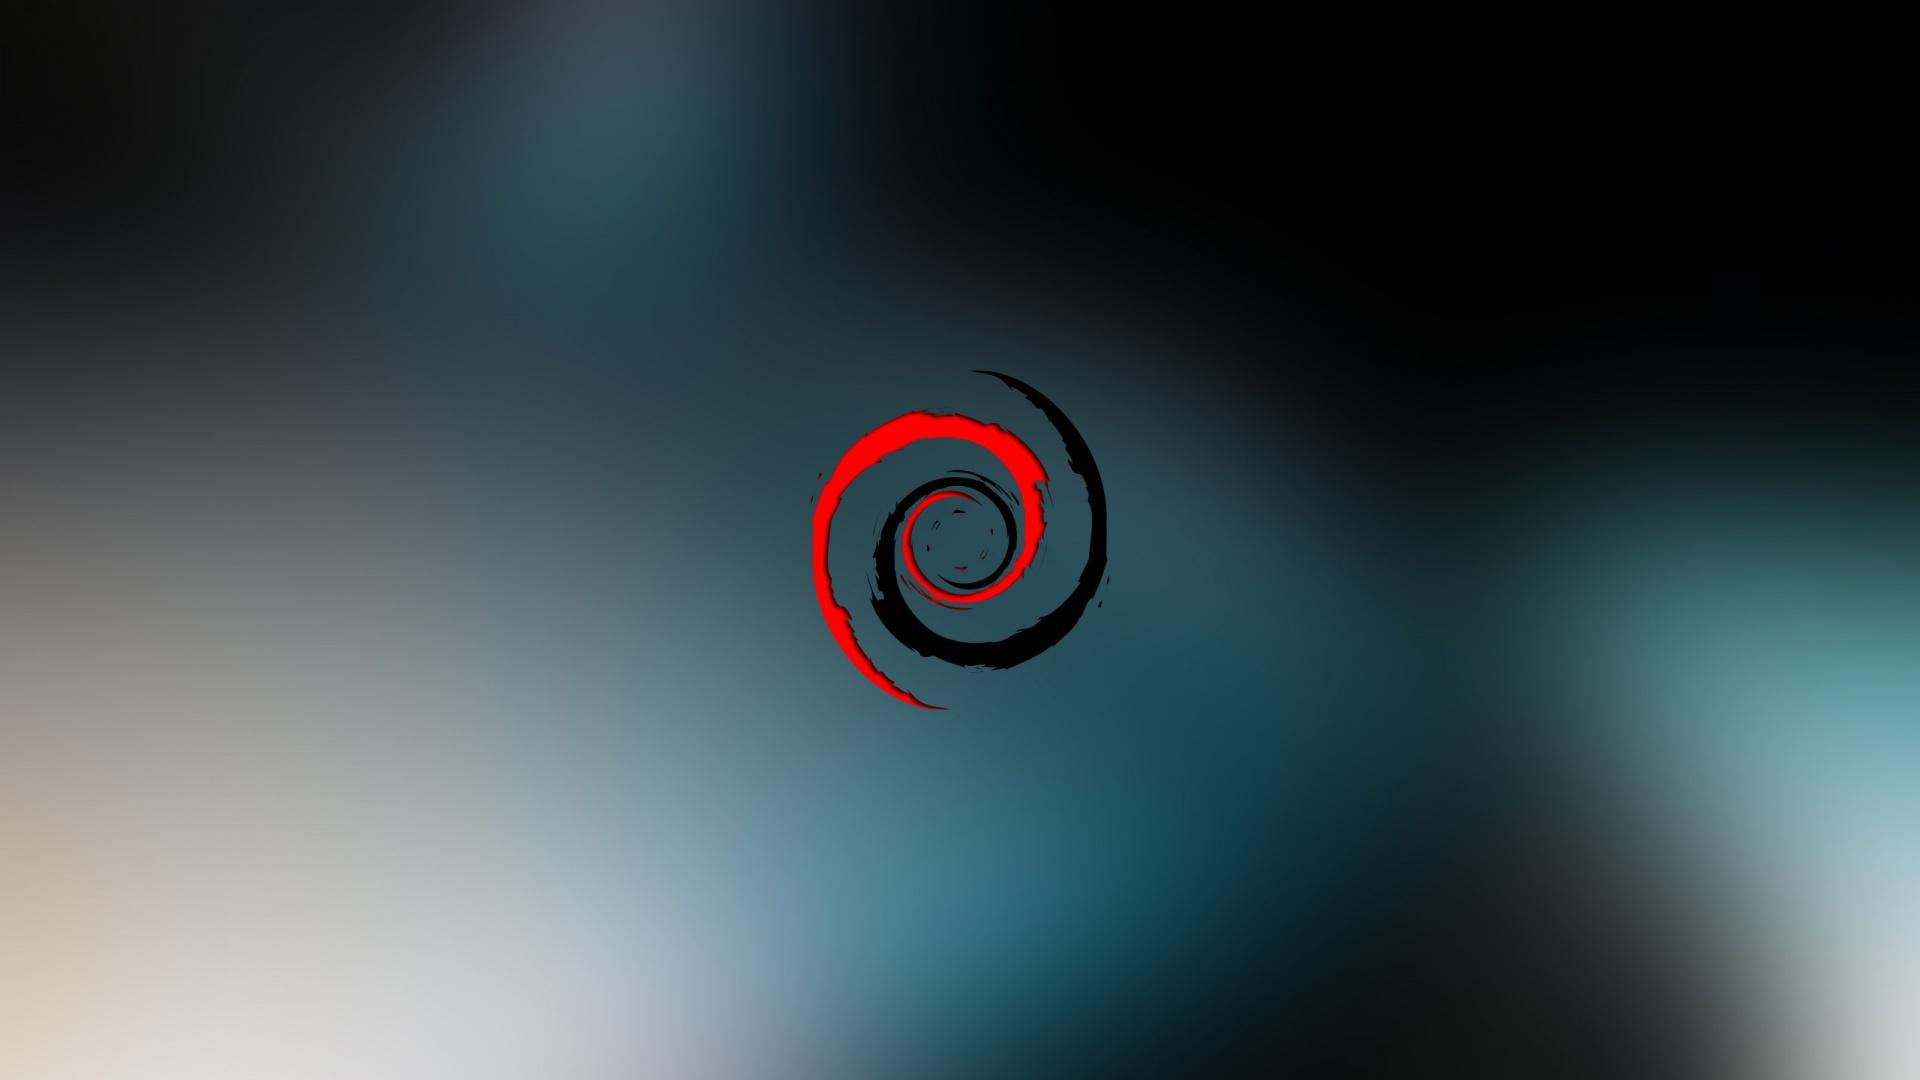 Debian Wallpaper 40684 1920x1080px 1920x1080